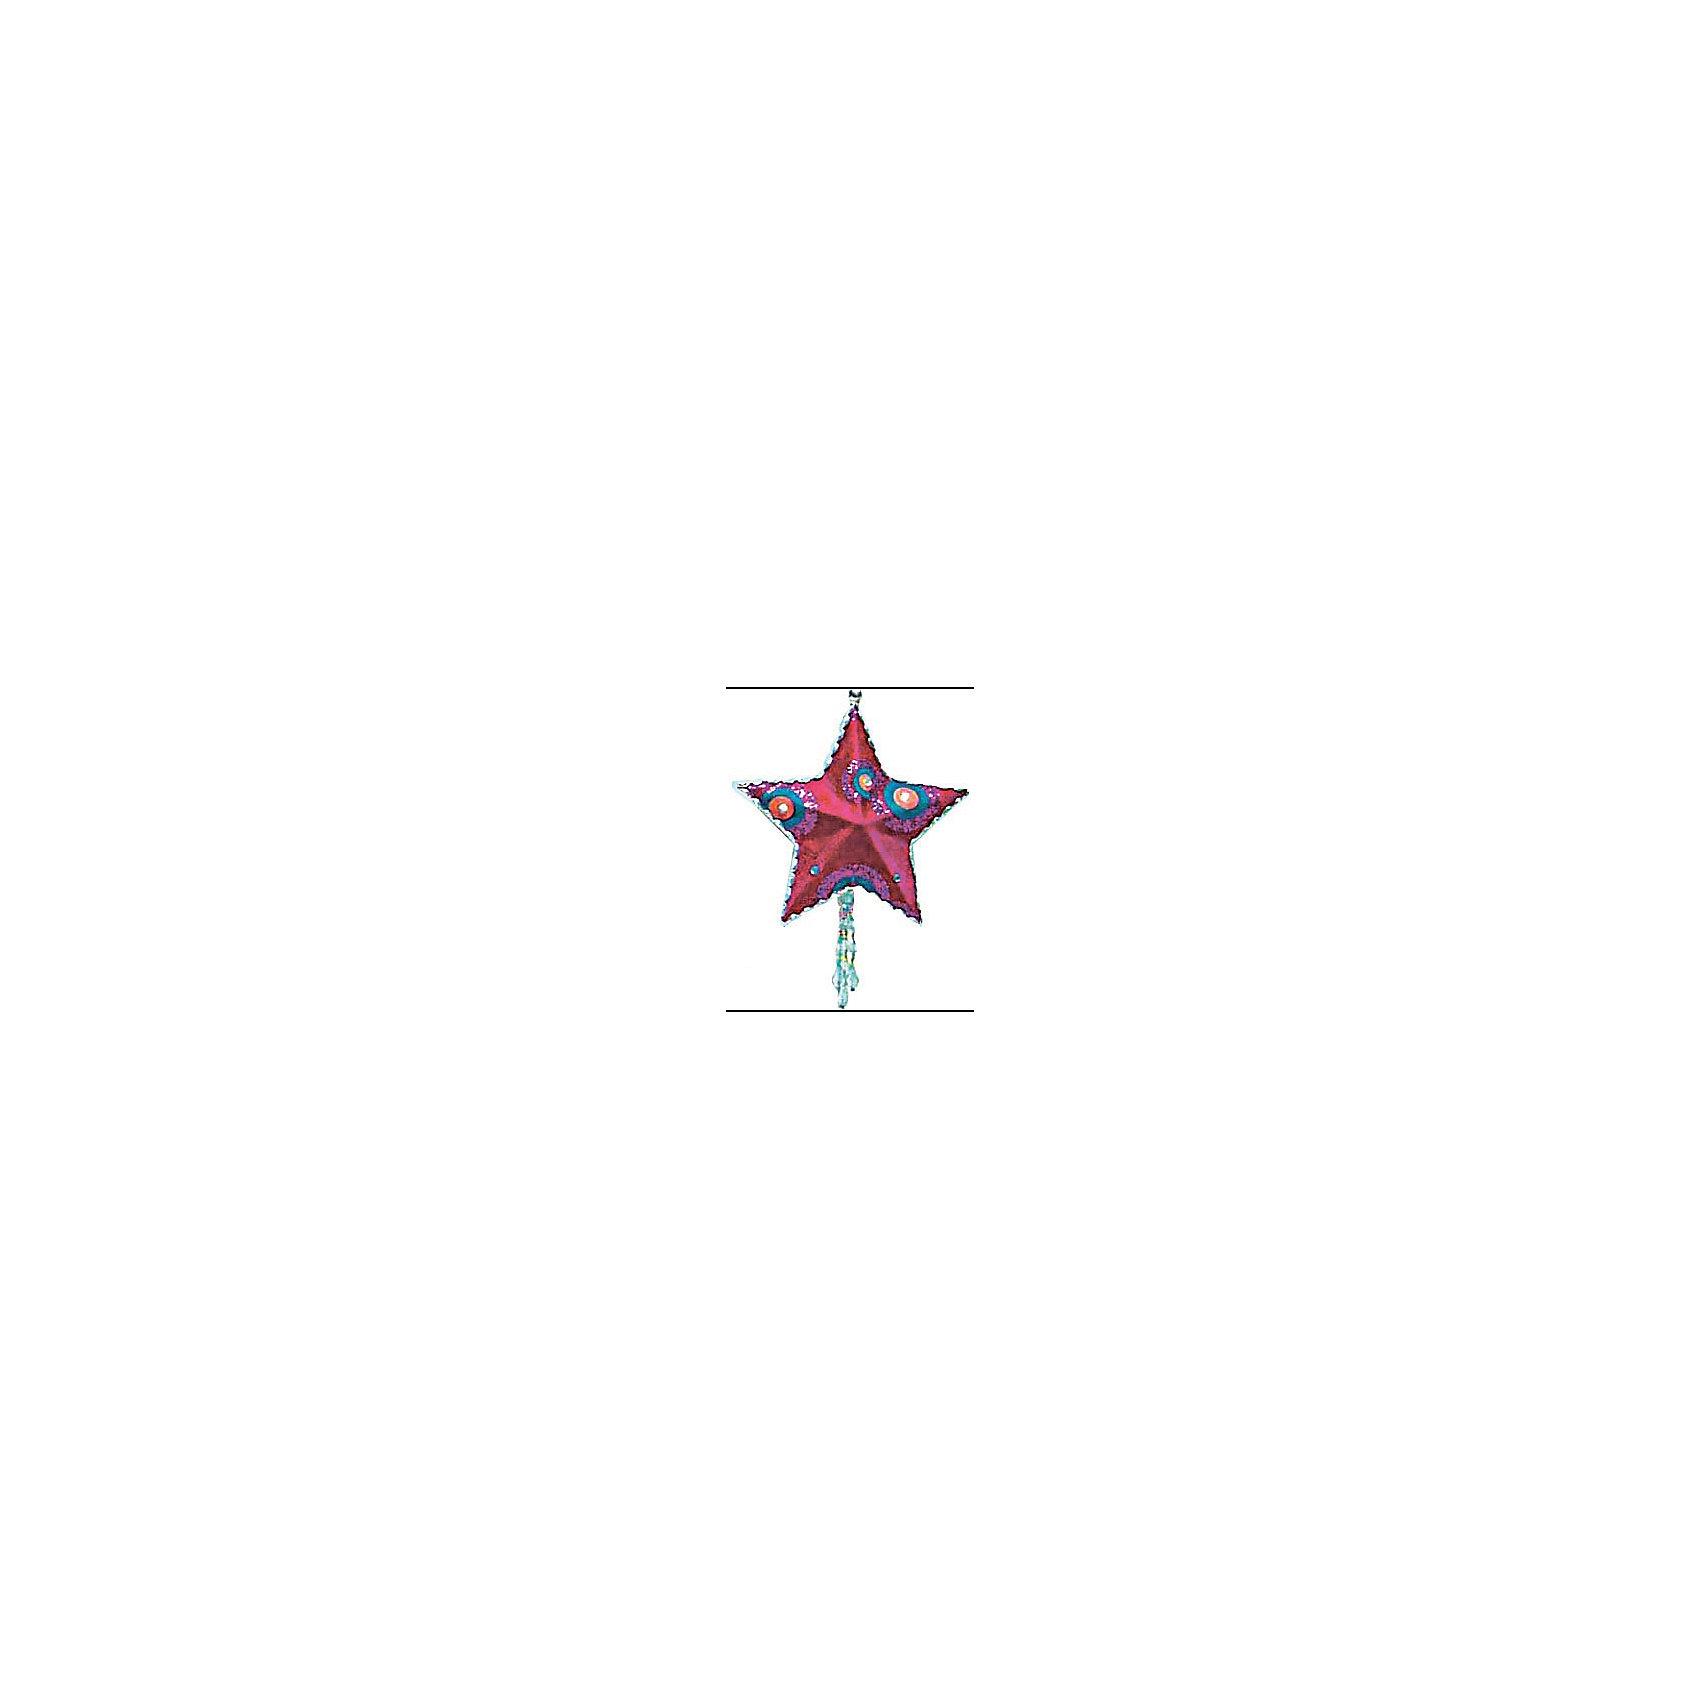 Украшение Детская: звезда флок, 13 смёл. укр. ДЕТСКАЯ звезда, флок, 13см, 1шт, малиновый<br><br>Ширина мм: 250<br>Глубина мм: 50<br>Высота мм: 50<br>Вес г: 100<br>Возраст от месяцев: 36<br>Возраст до месяцев: 2147483647<br>Пол: Унисекс<br>Возраст: Детский<br>SKU: 5101101